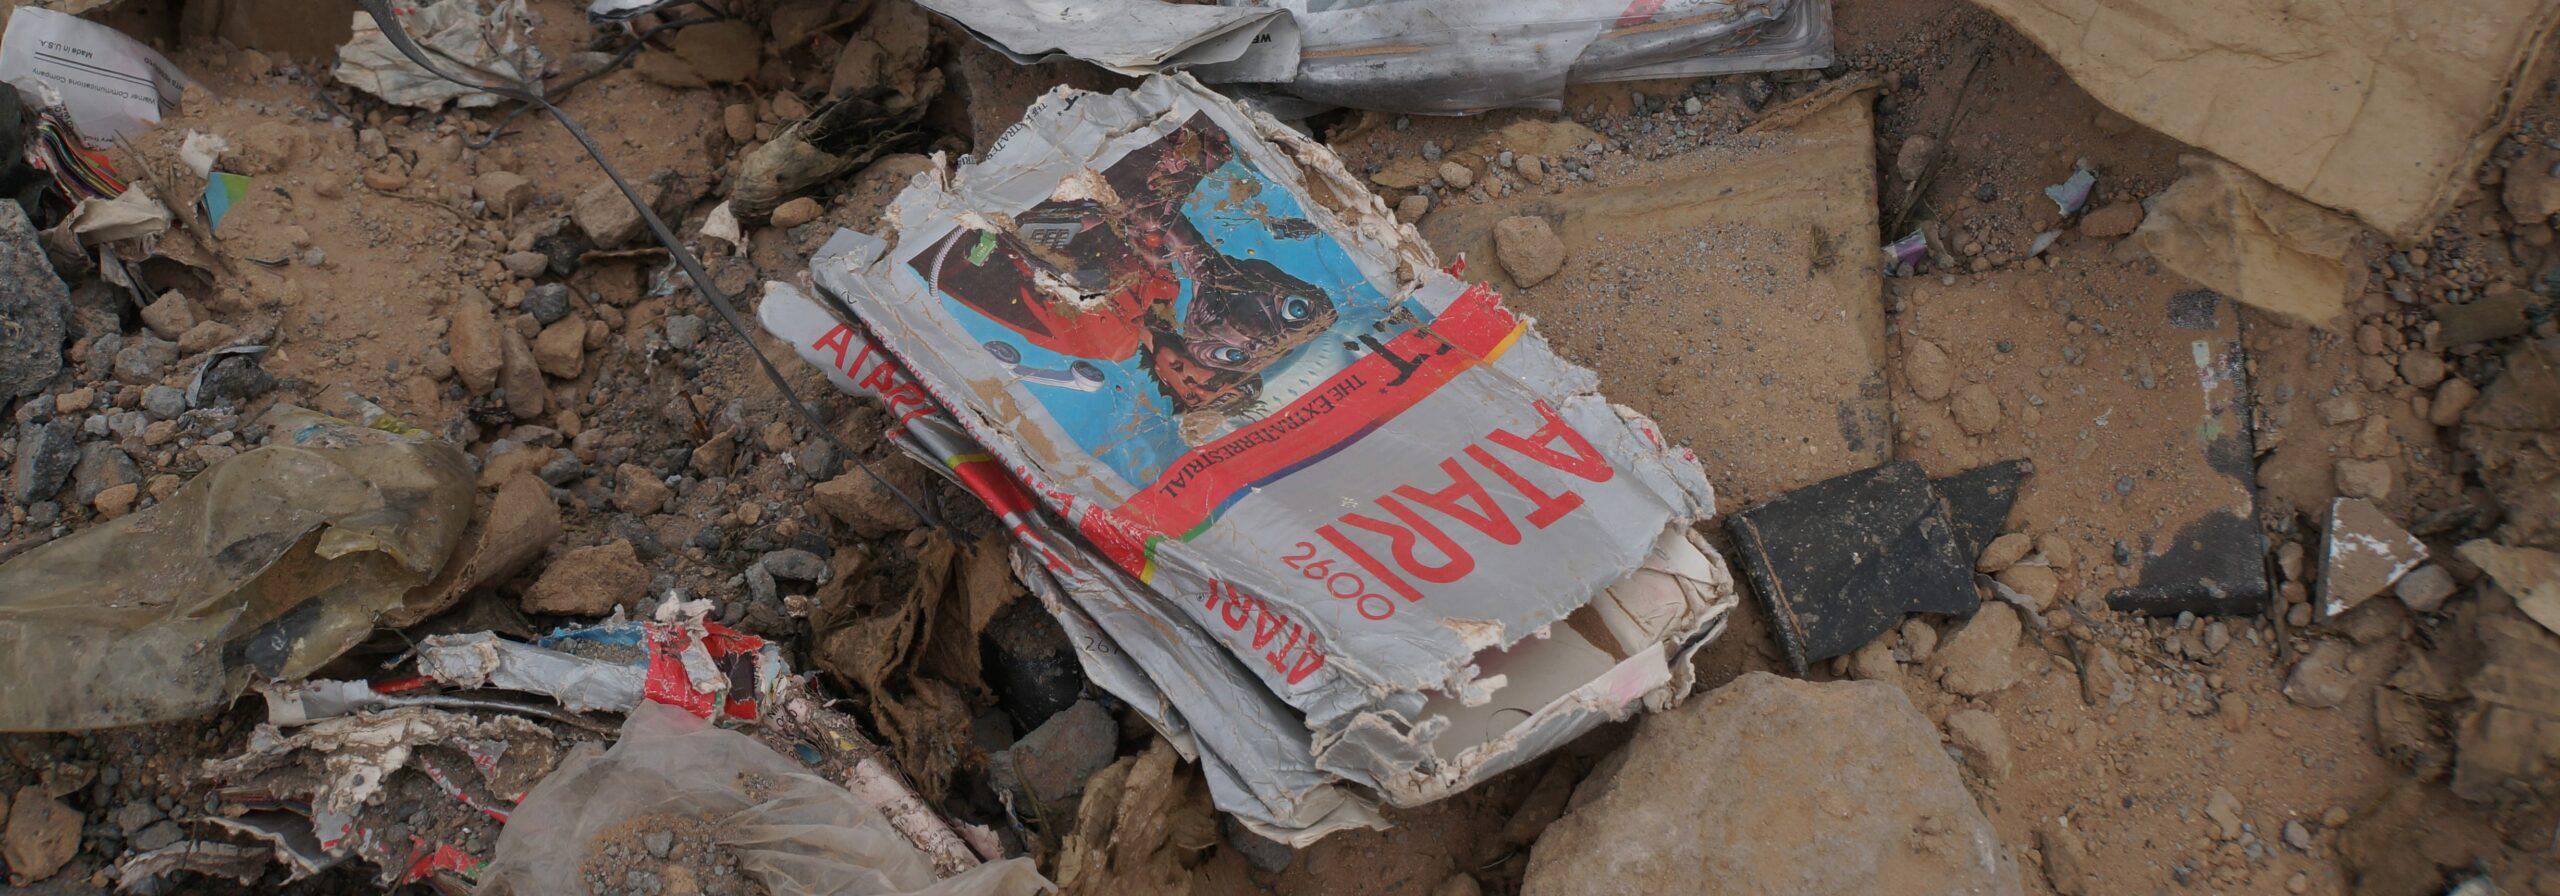 Atari's ET video game in the trash